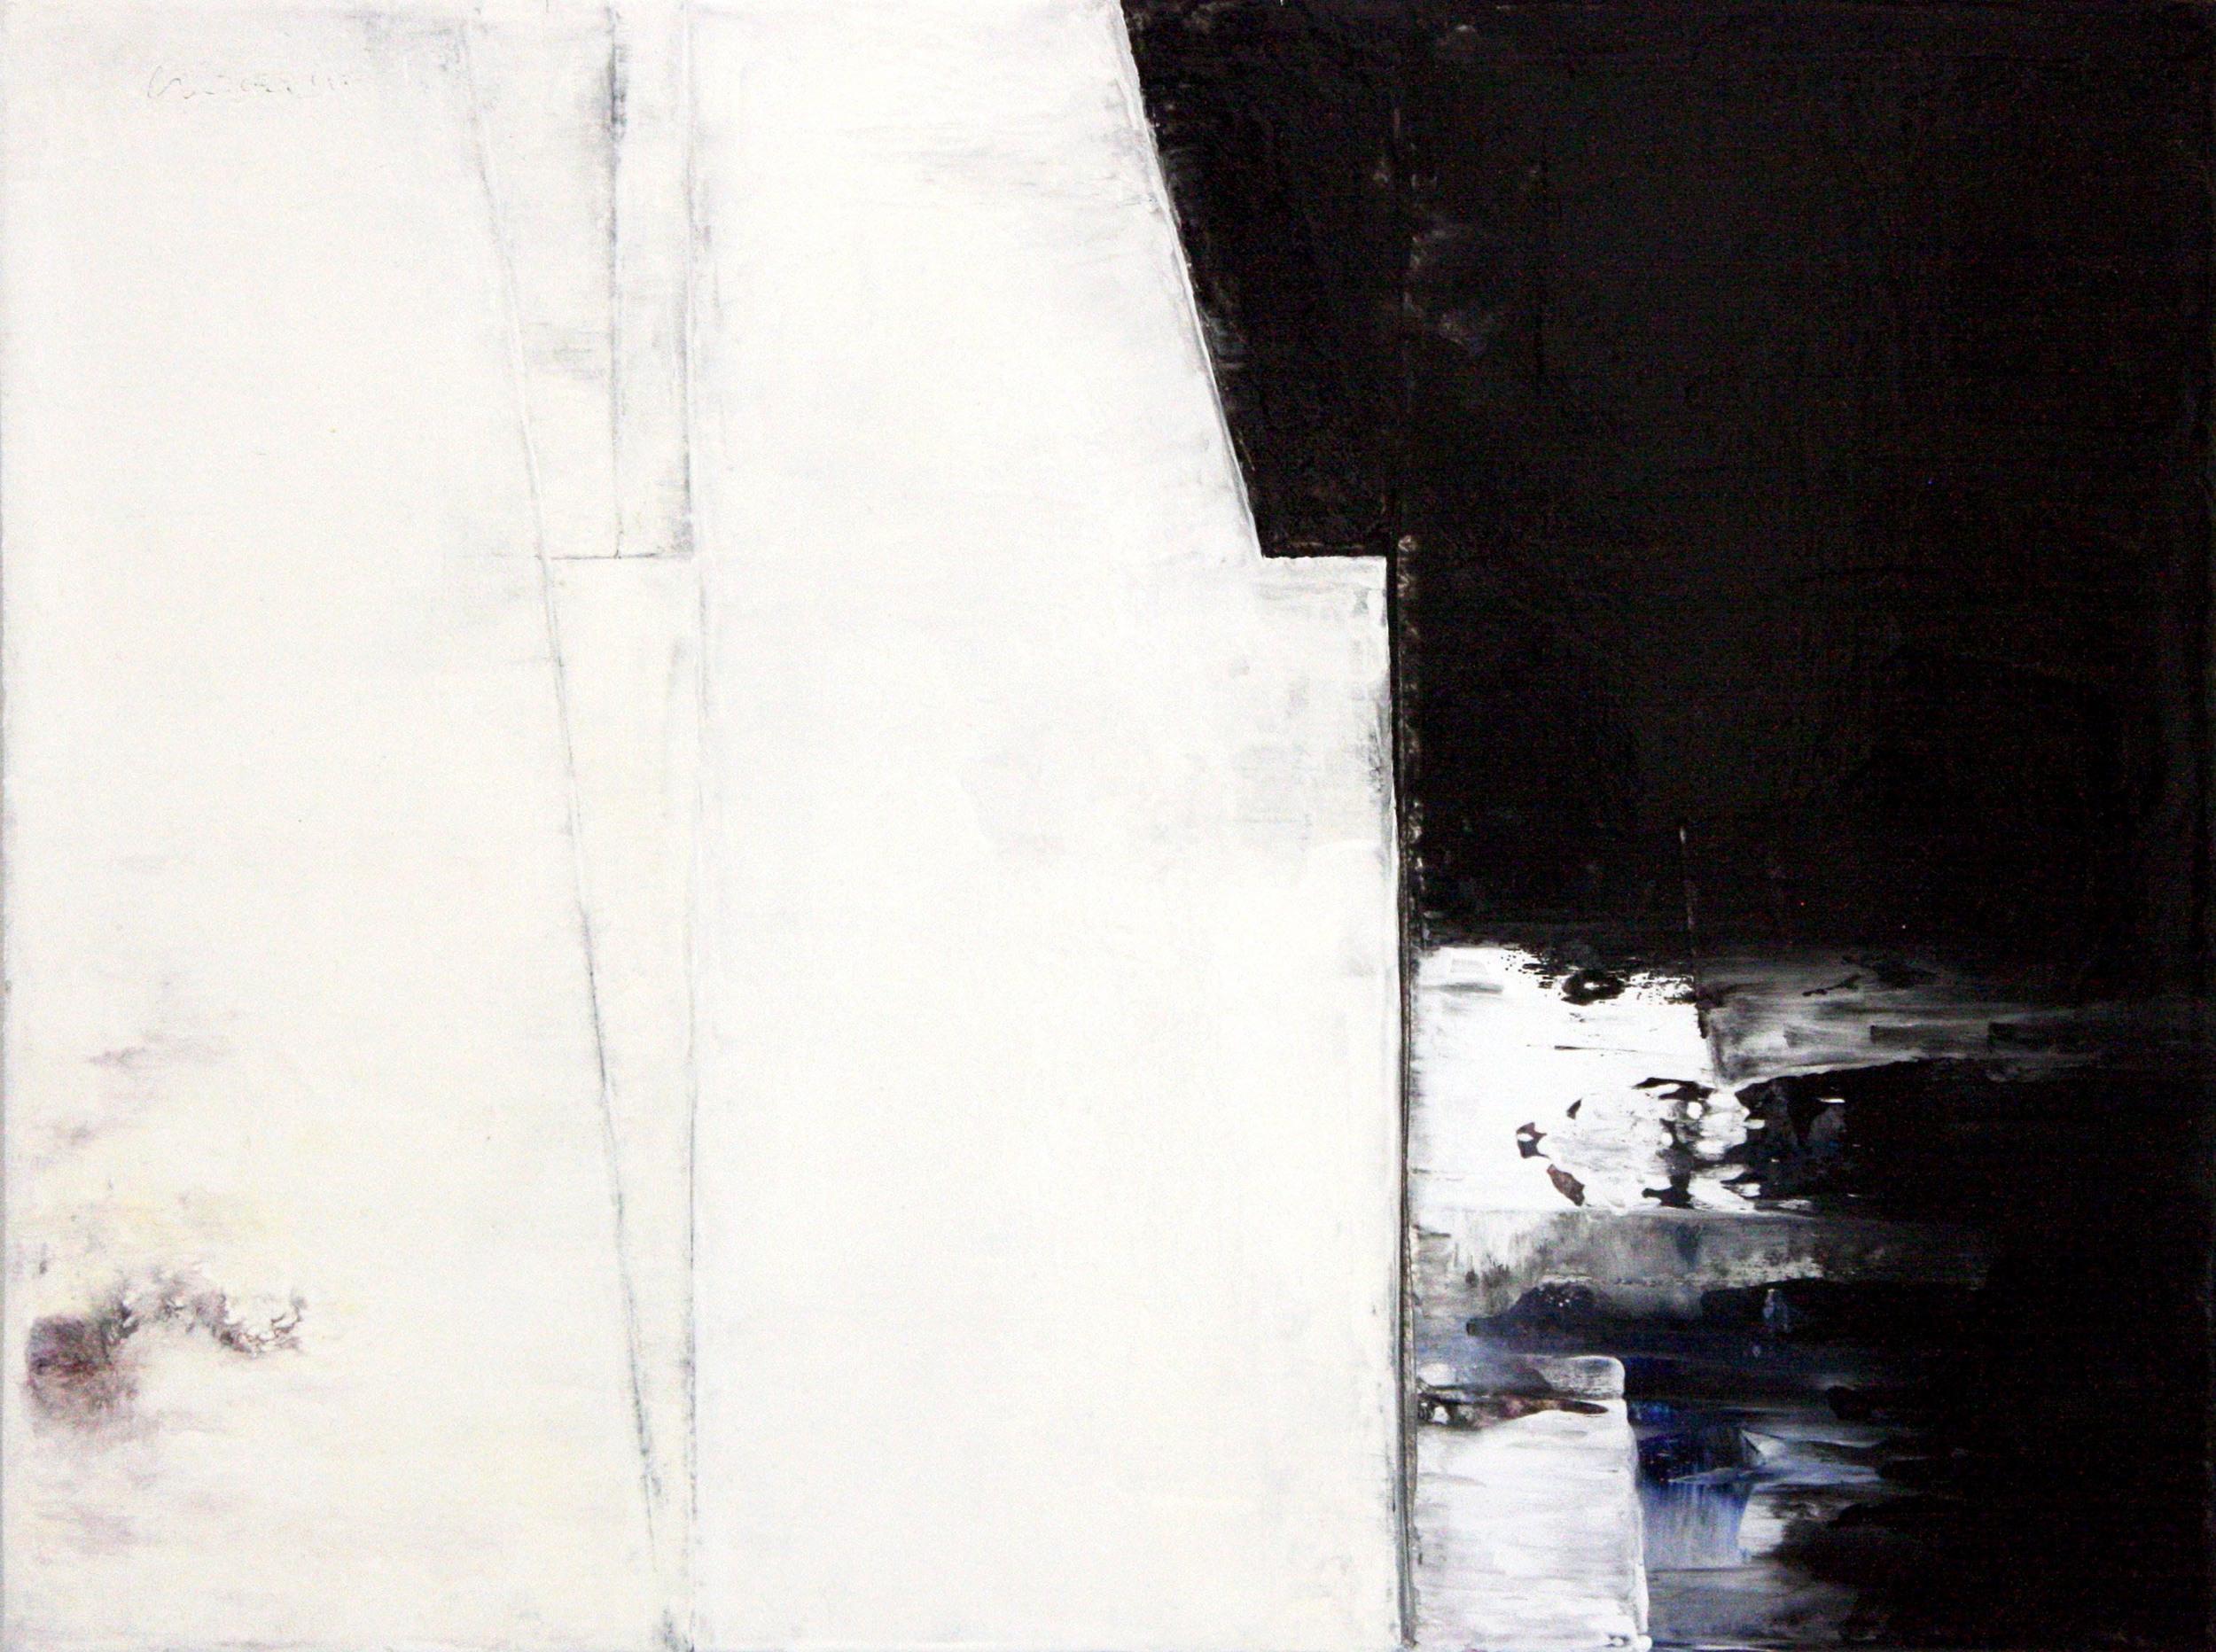 Envoi #2  , 2014 oil on canvas, 12 x 16 inches